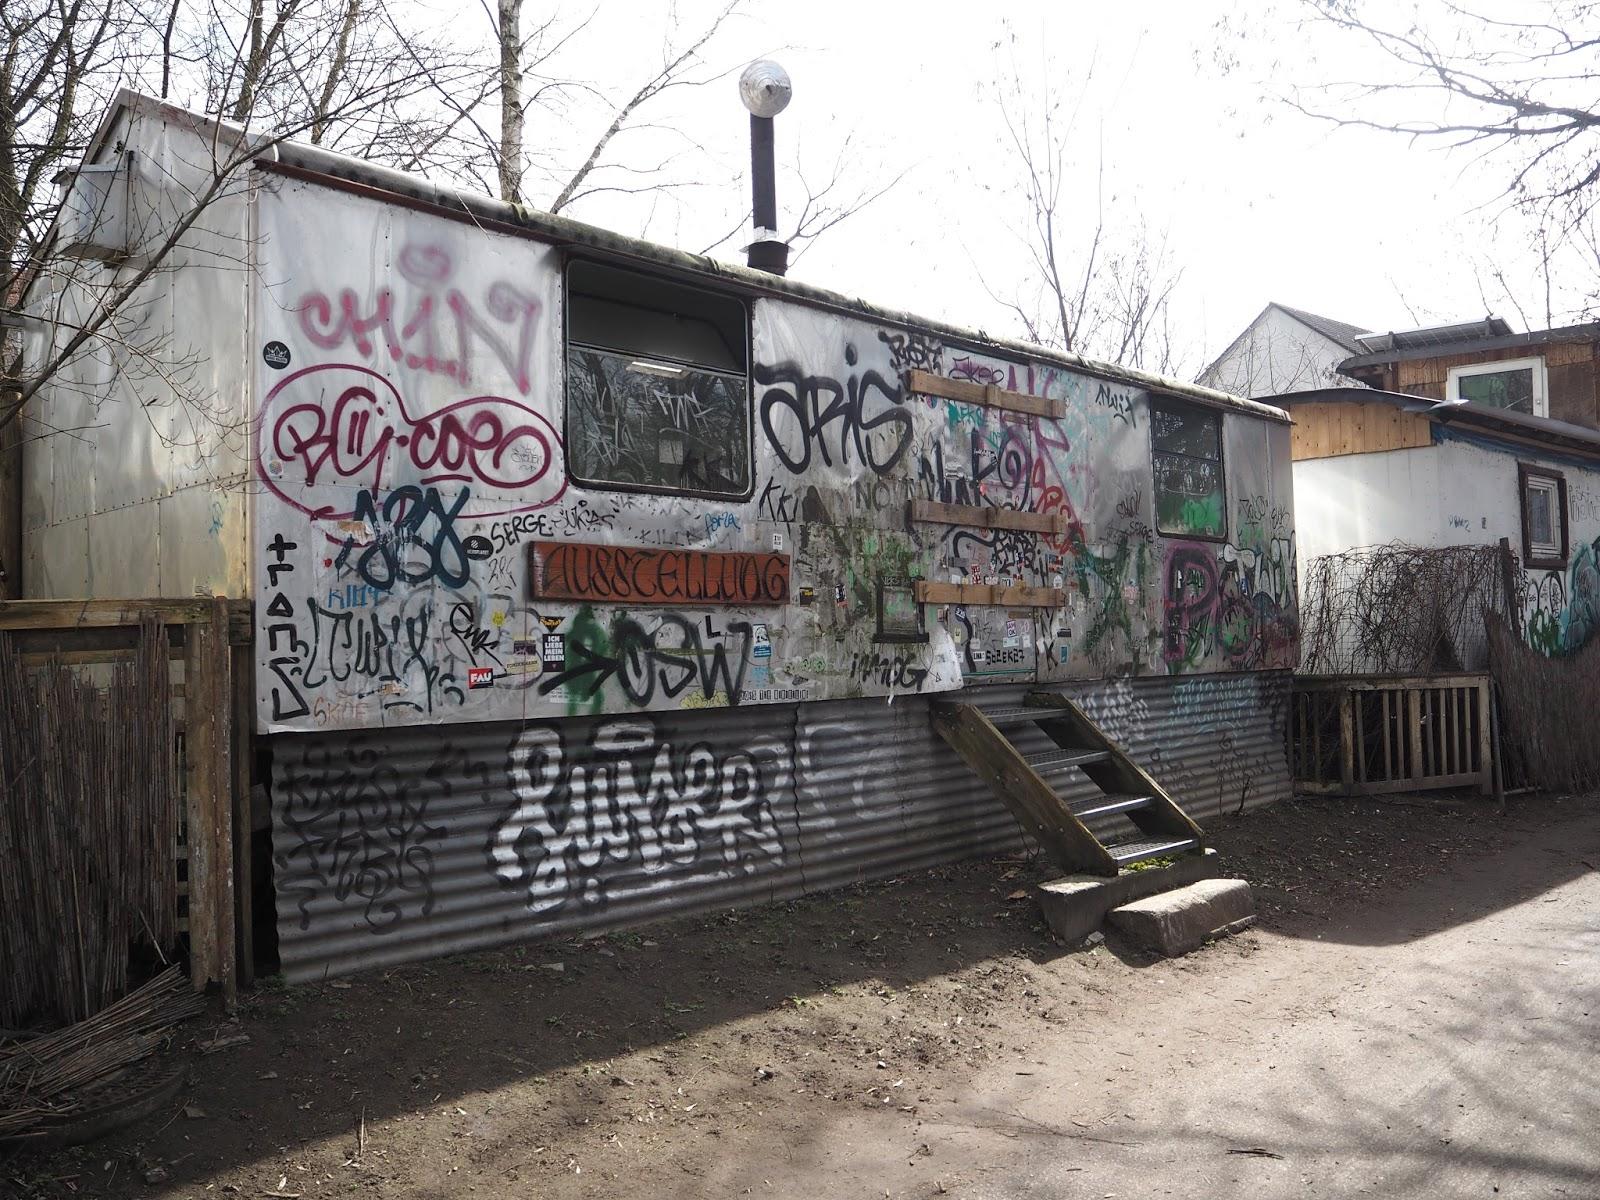 Berlin travel photo diary